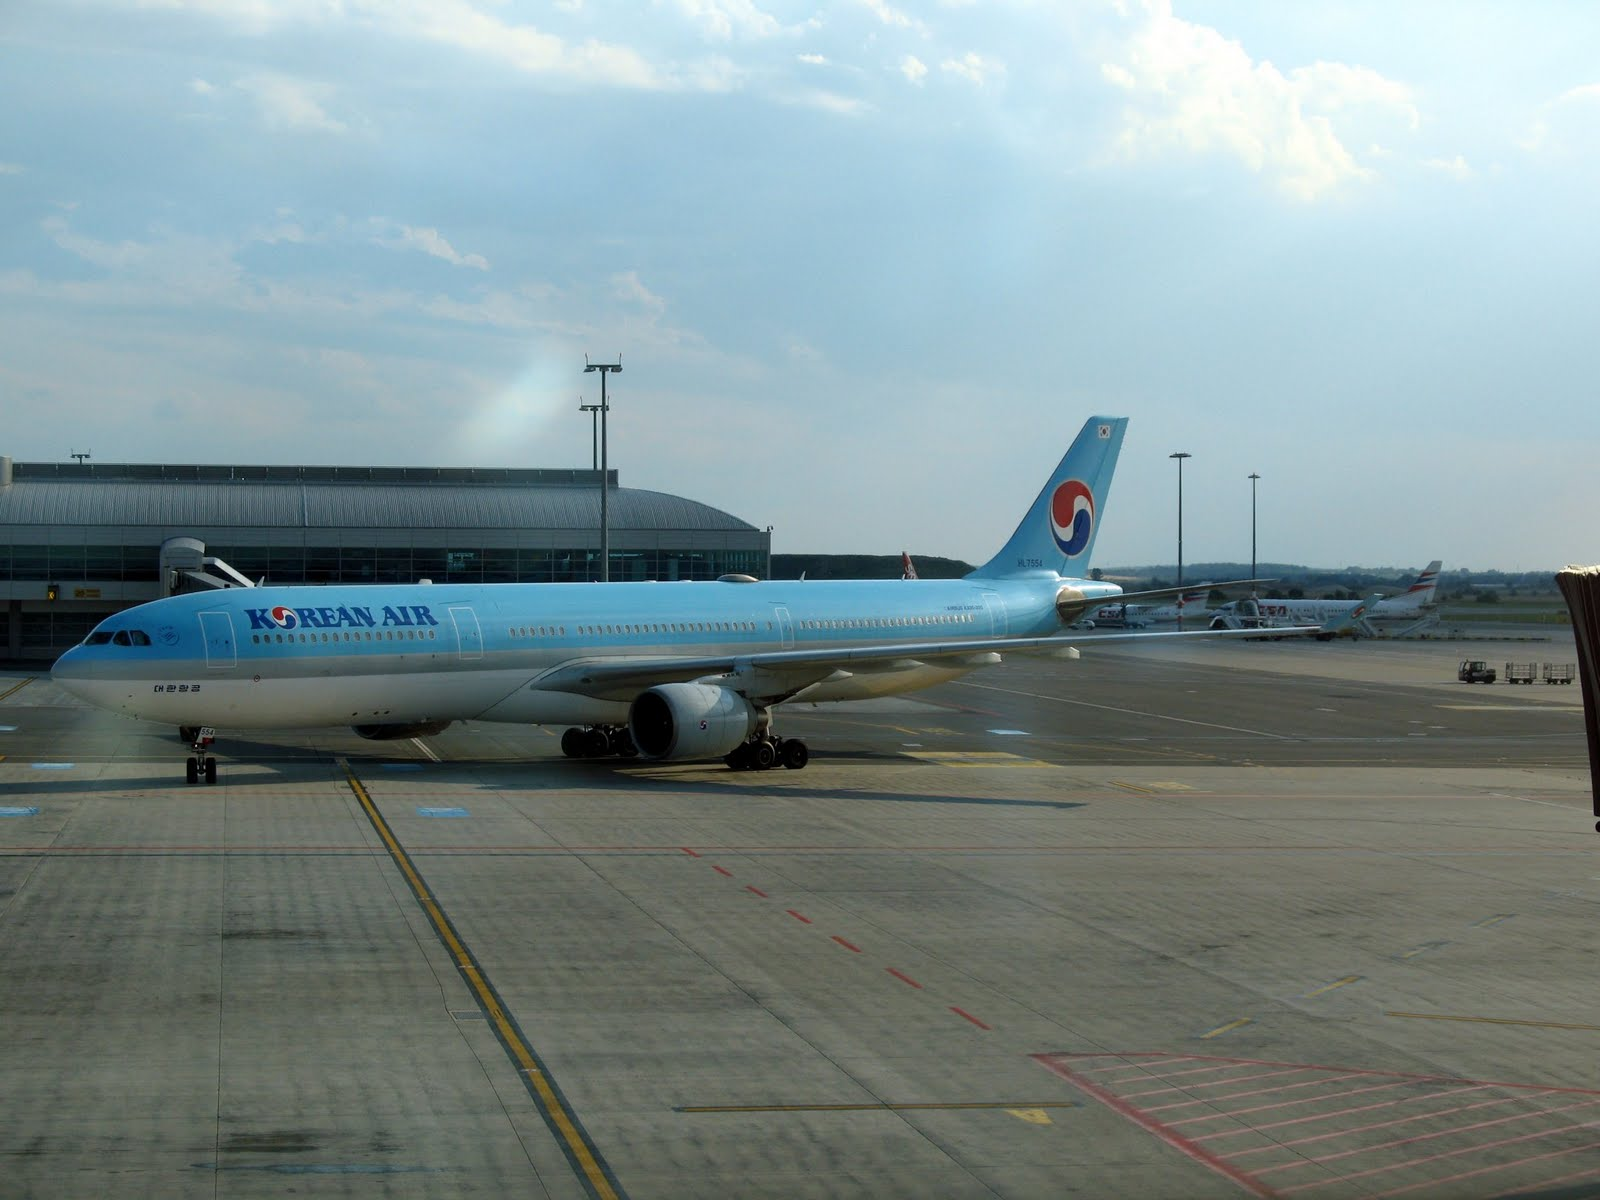 http://2.bp.blogspot.com/-tz2bWsj91Yg/Tesi-XfPYZI/AAAAAAAAEi8/461gwFs_i7Q/s1600/Korean%2BAirlines%2BWallpapers%2B%25289%2529.jpg